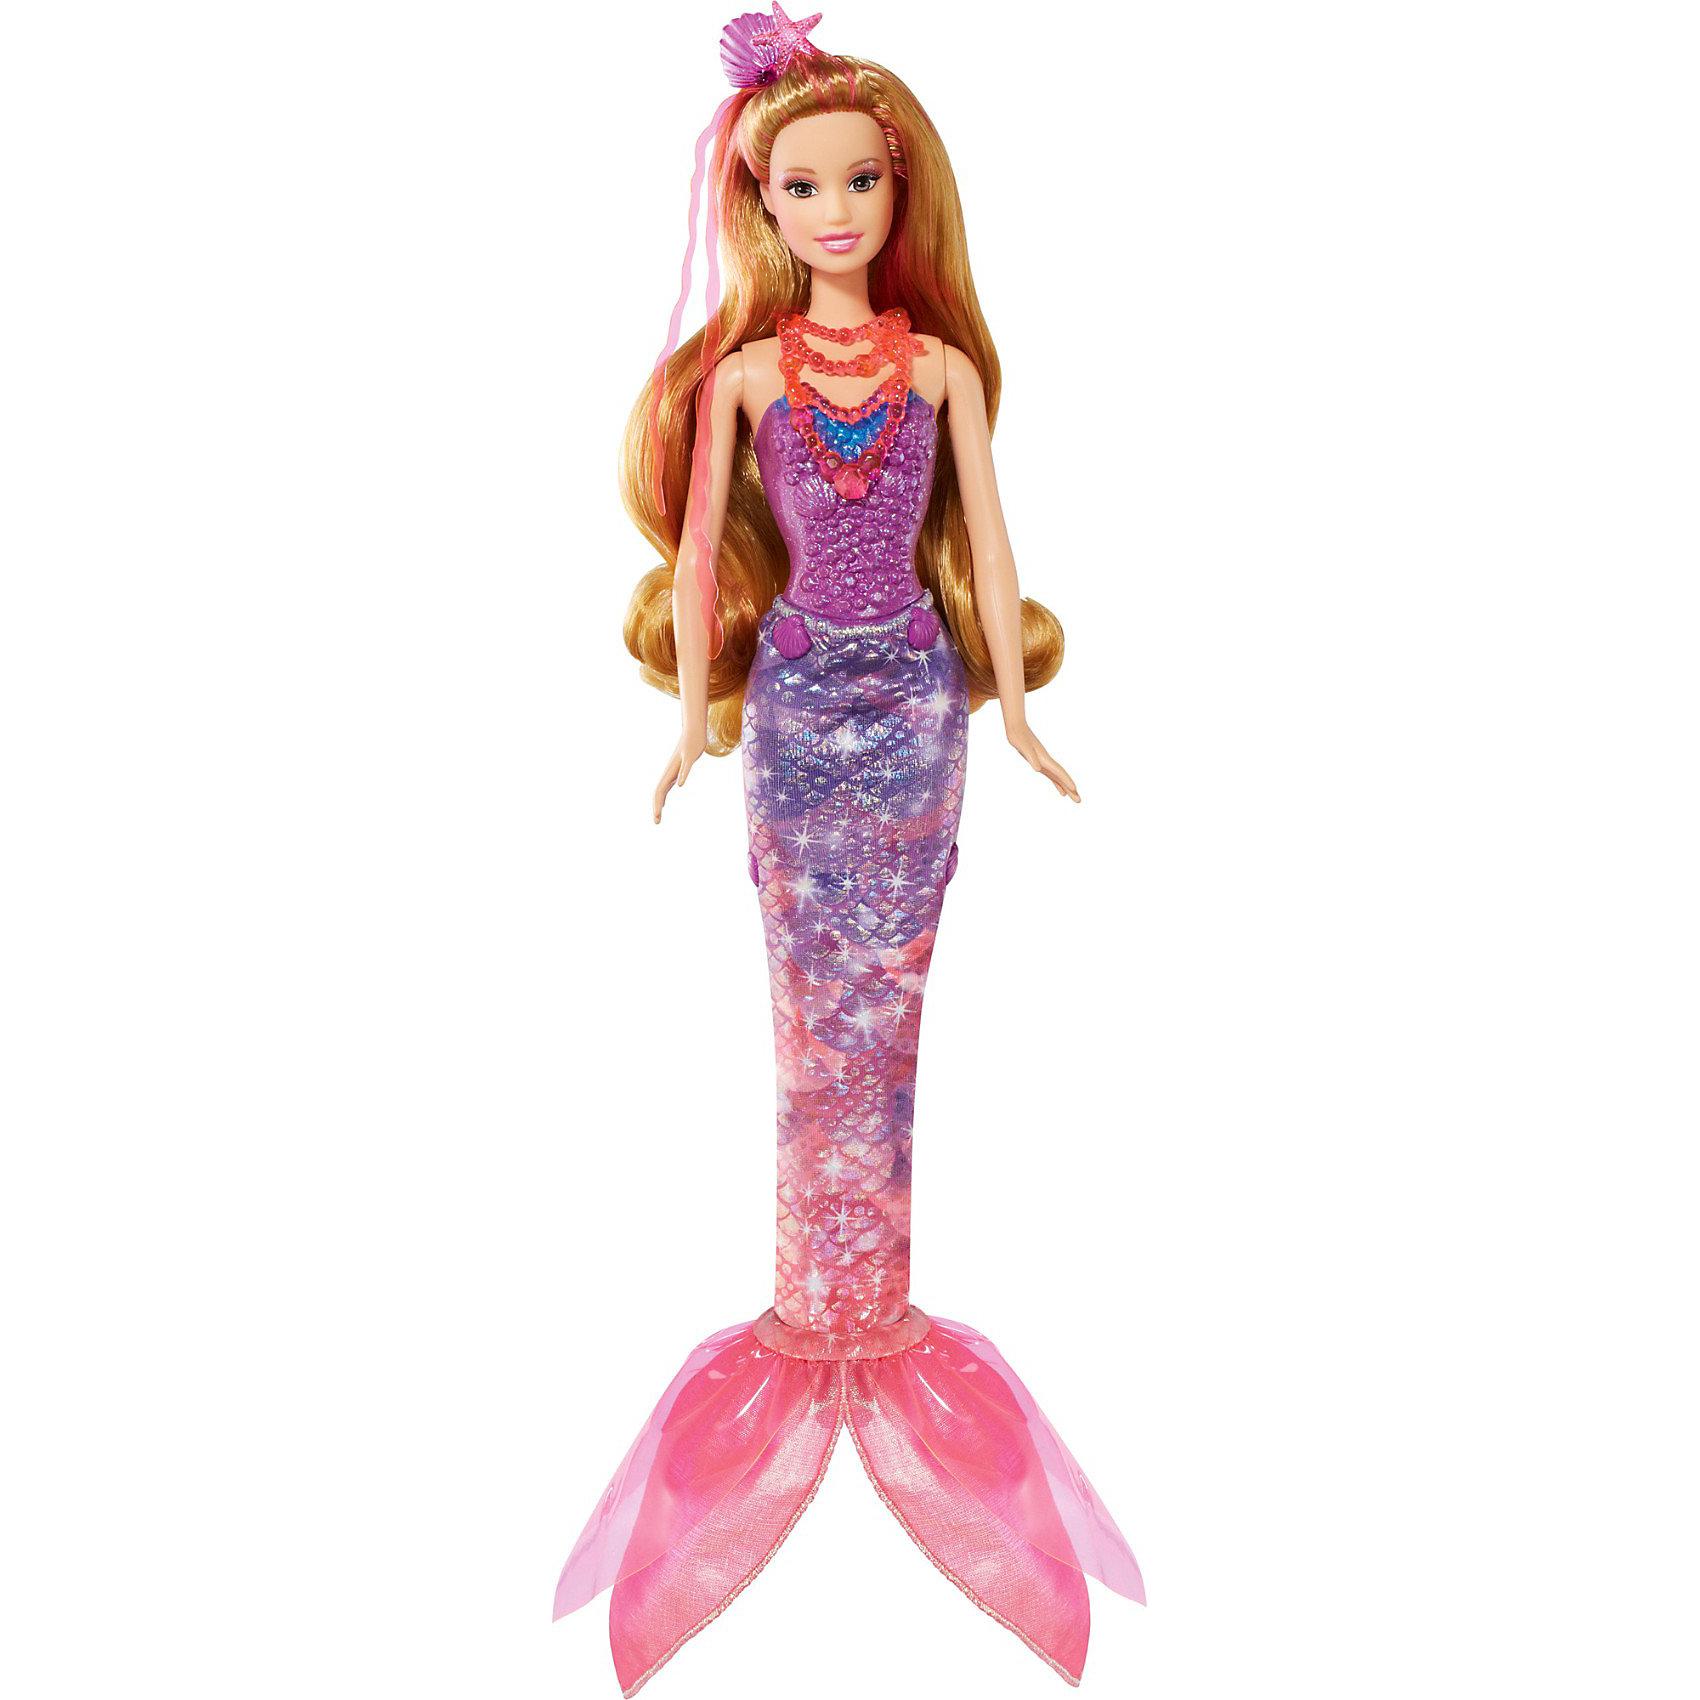 Кукла Русалка Потайная дверь, Barbie